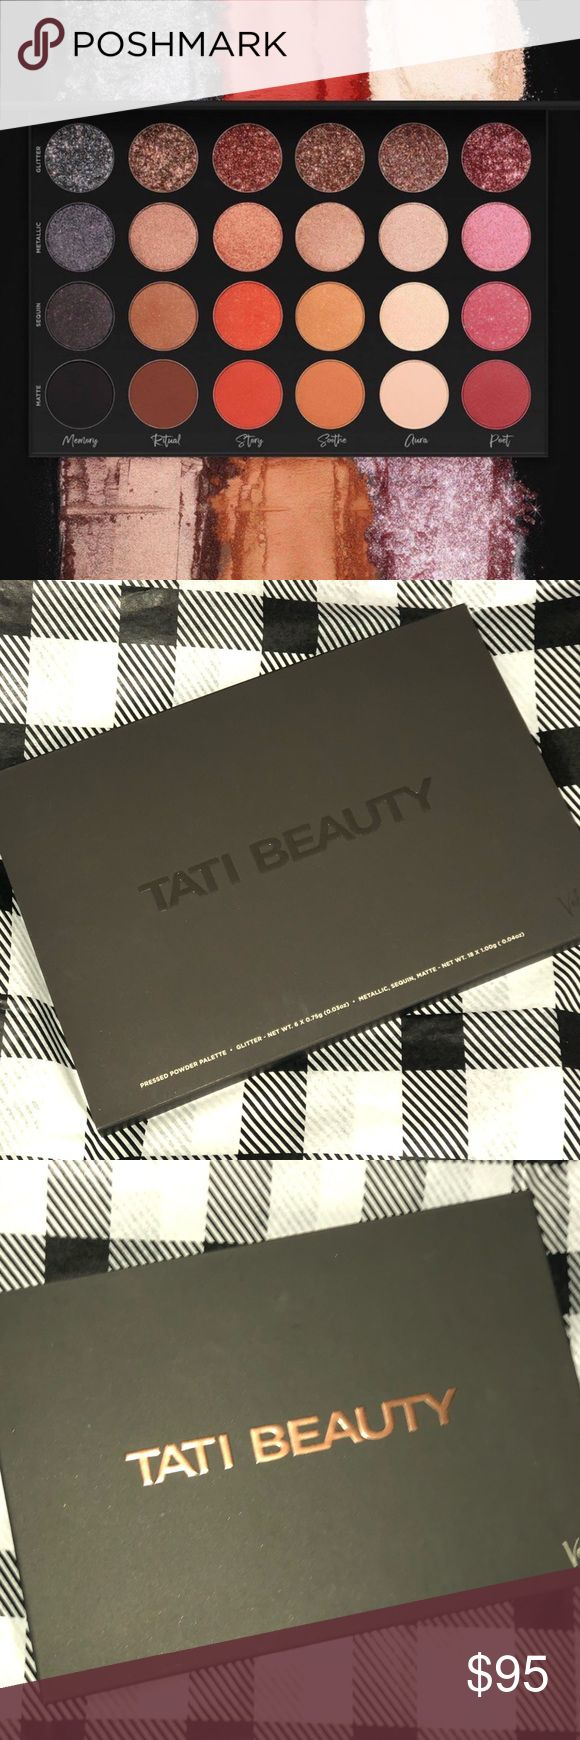 TATI BEAUTY Pressed Powder Palette VOL. 1 Colorful